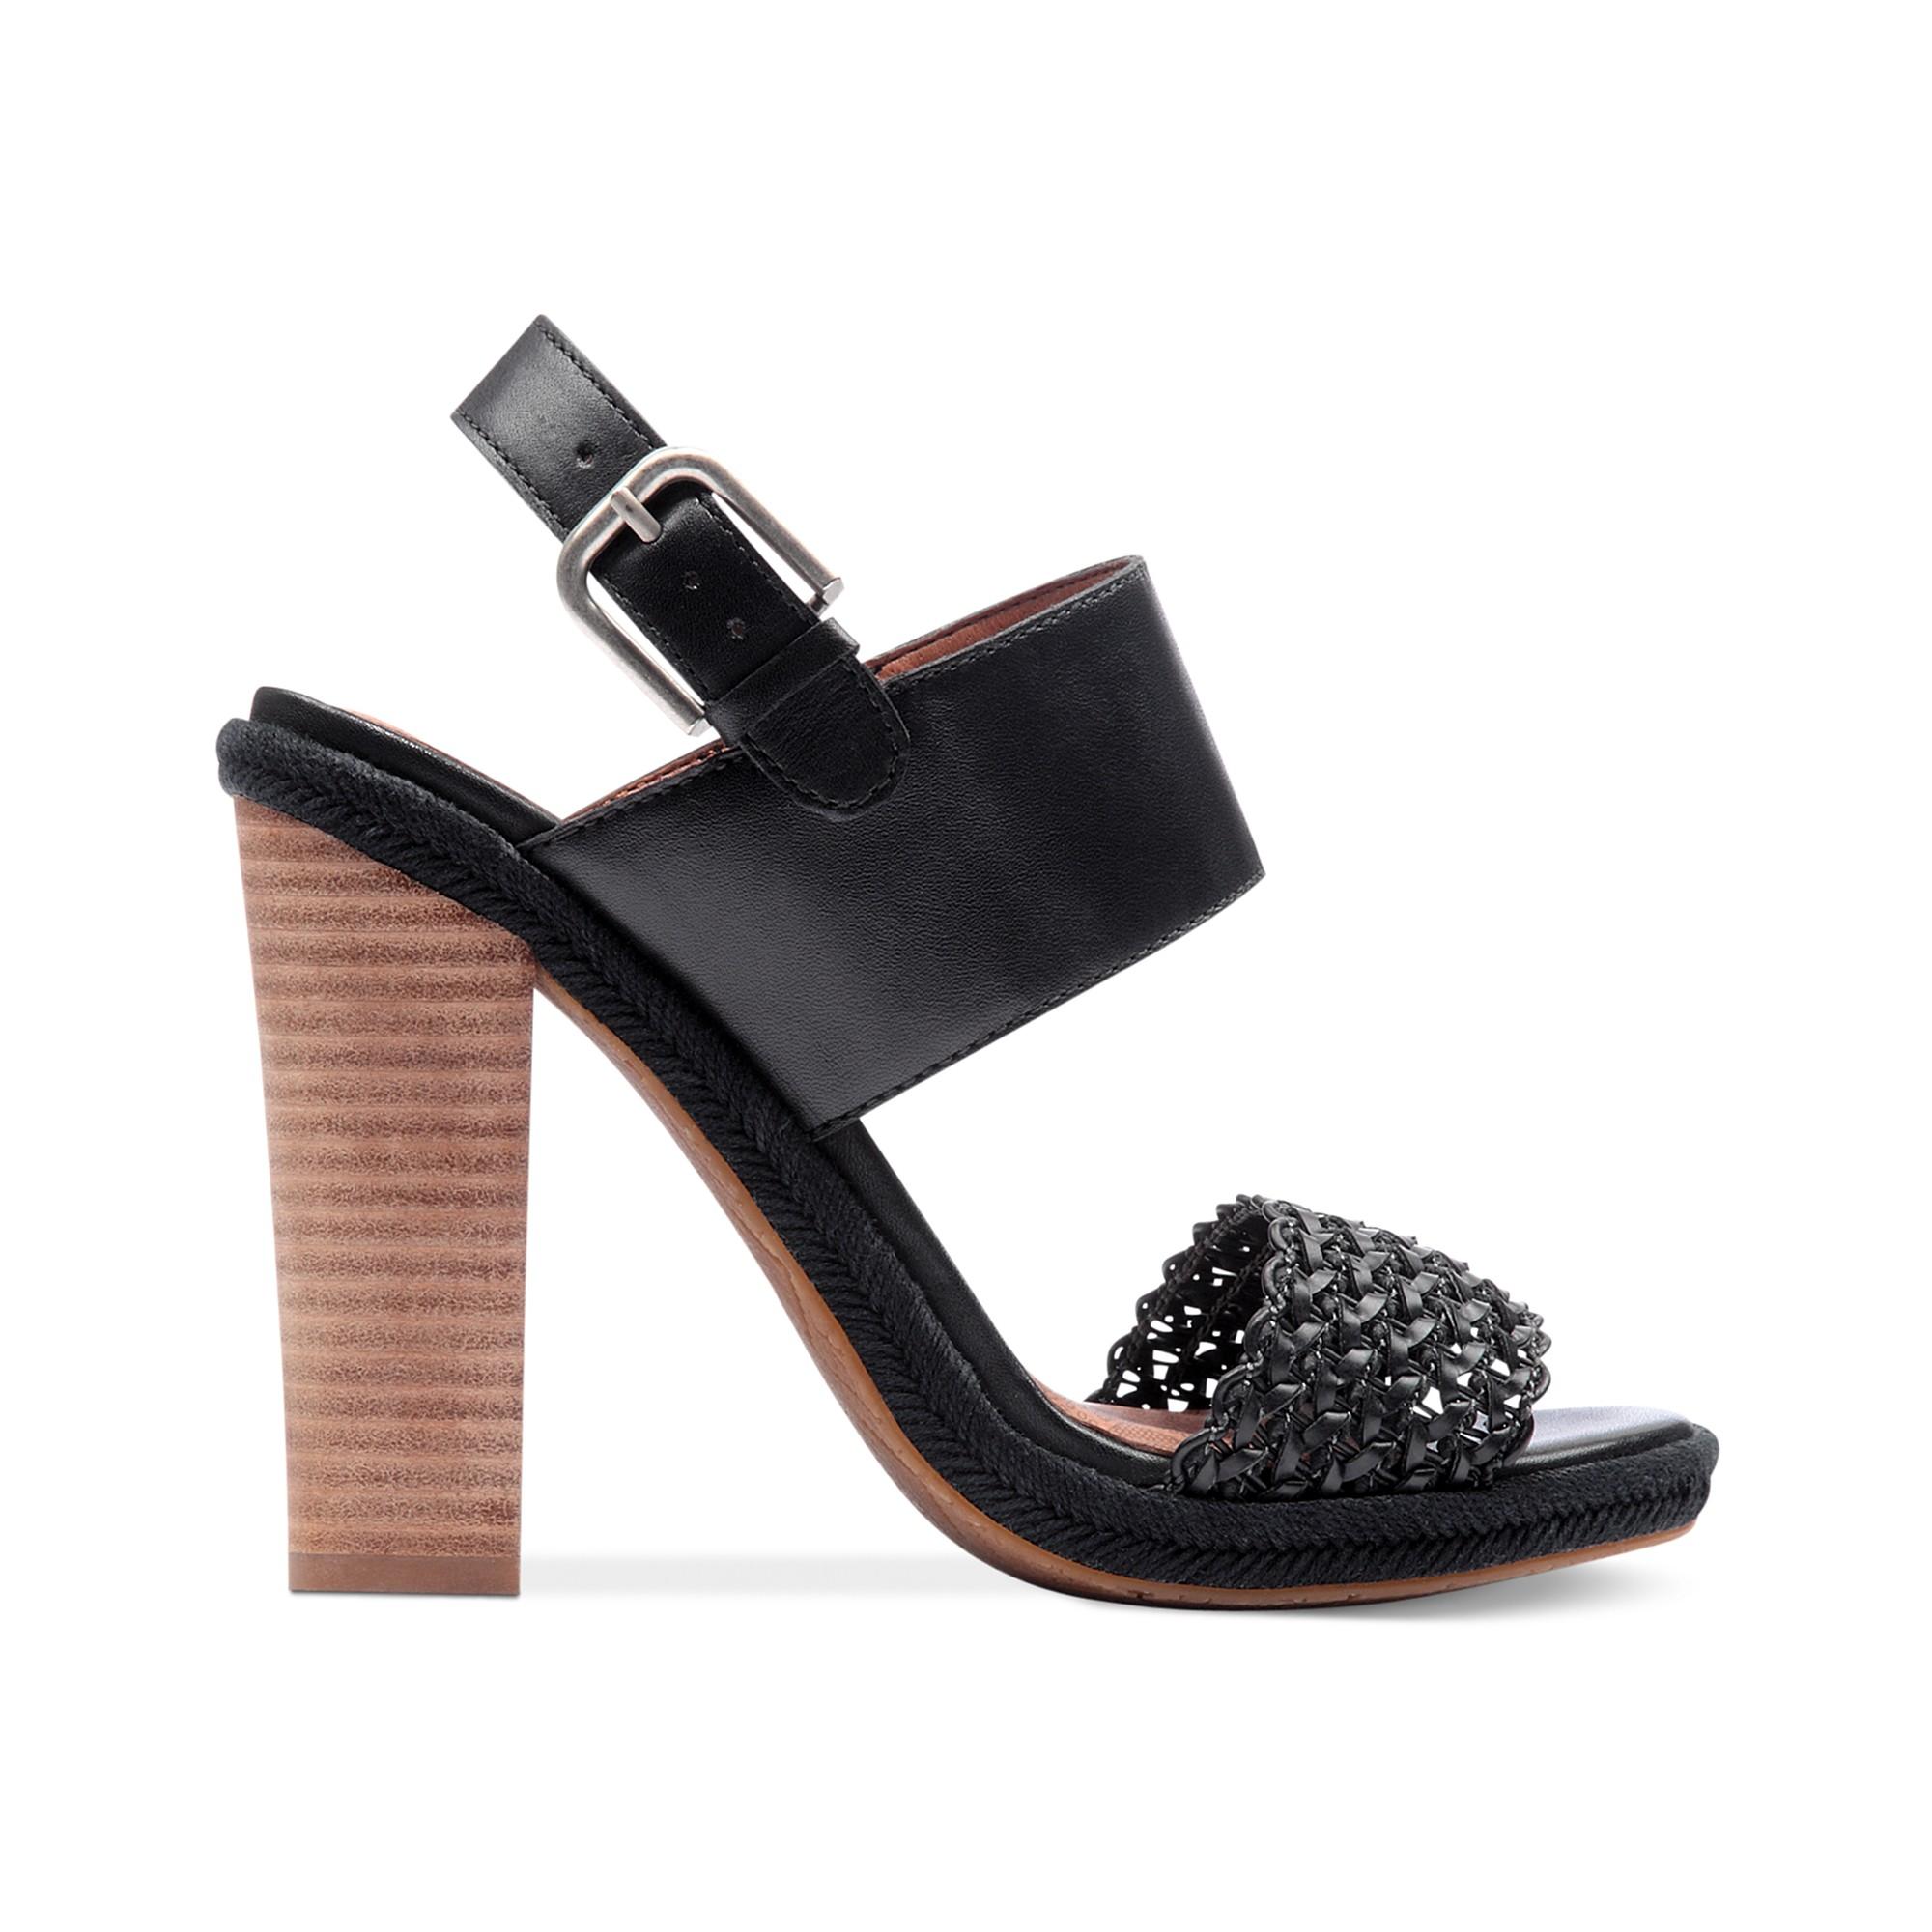 494f8ba4189 Lyst - Lucky Brand Putnam Sandals in Black